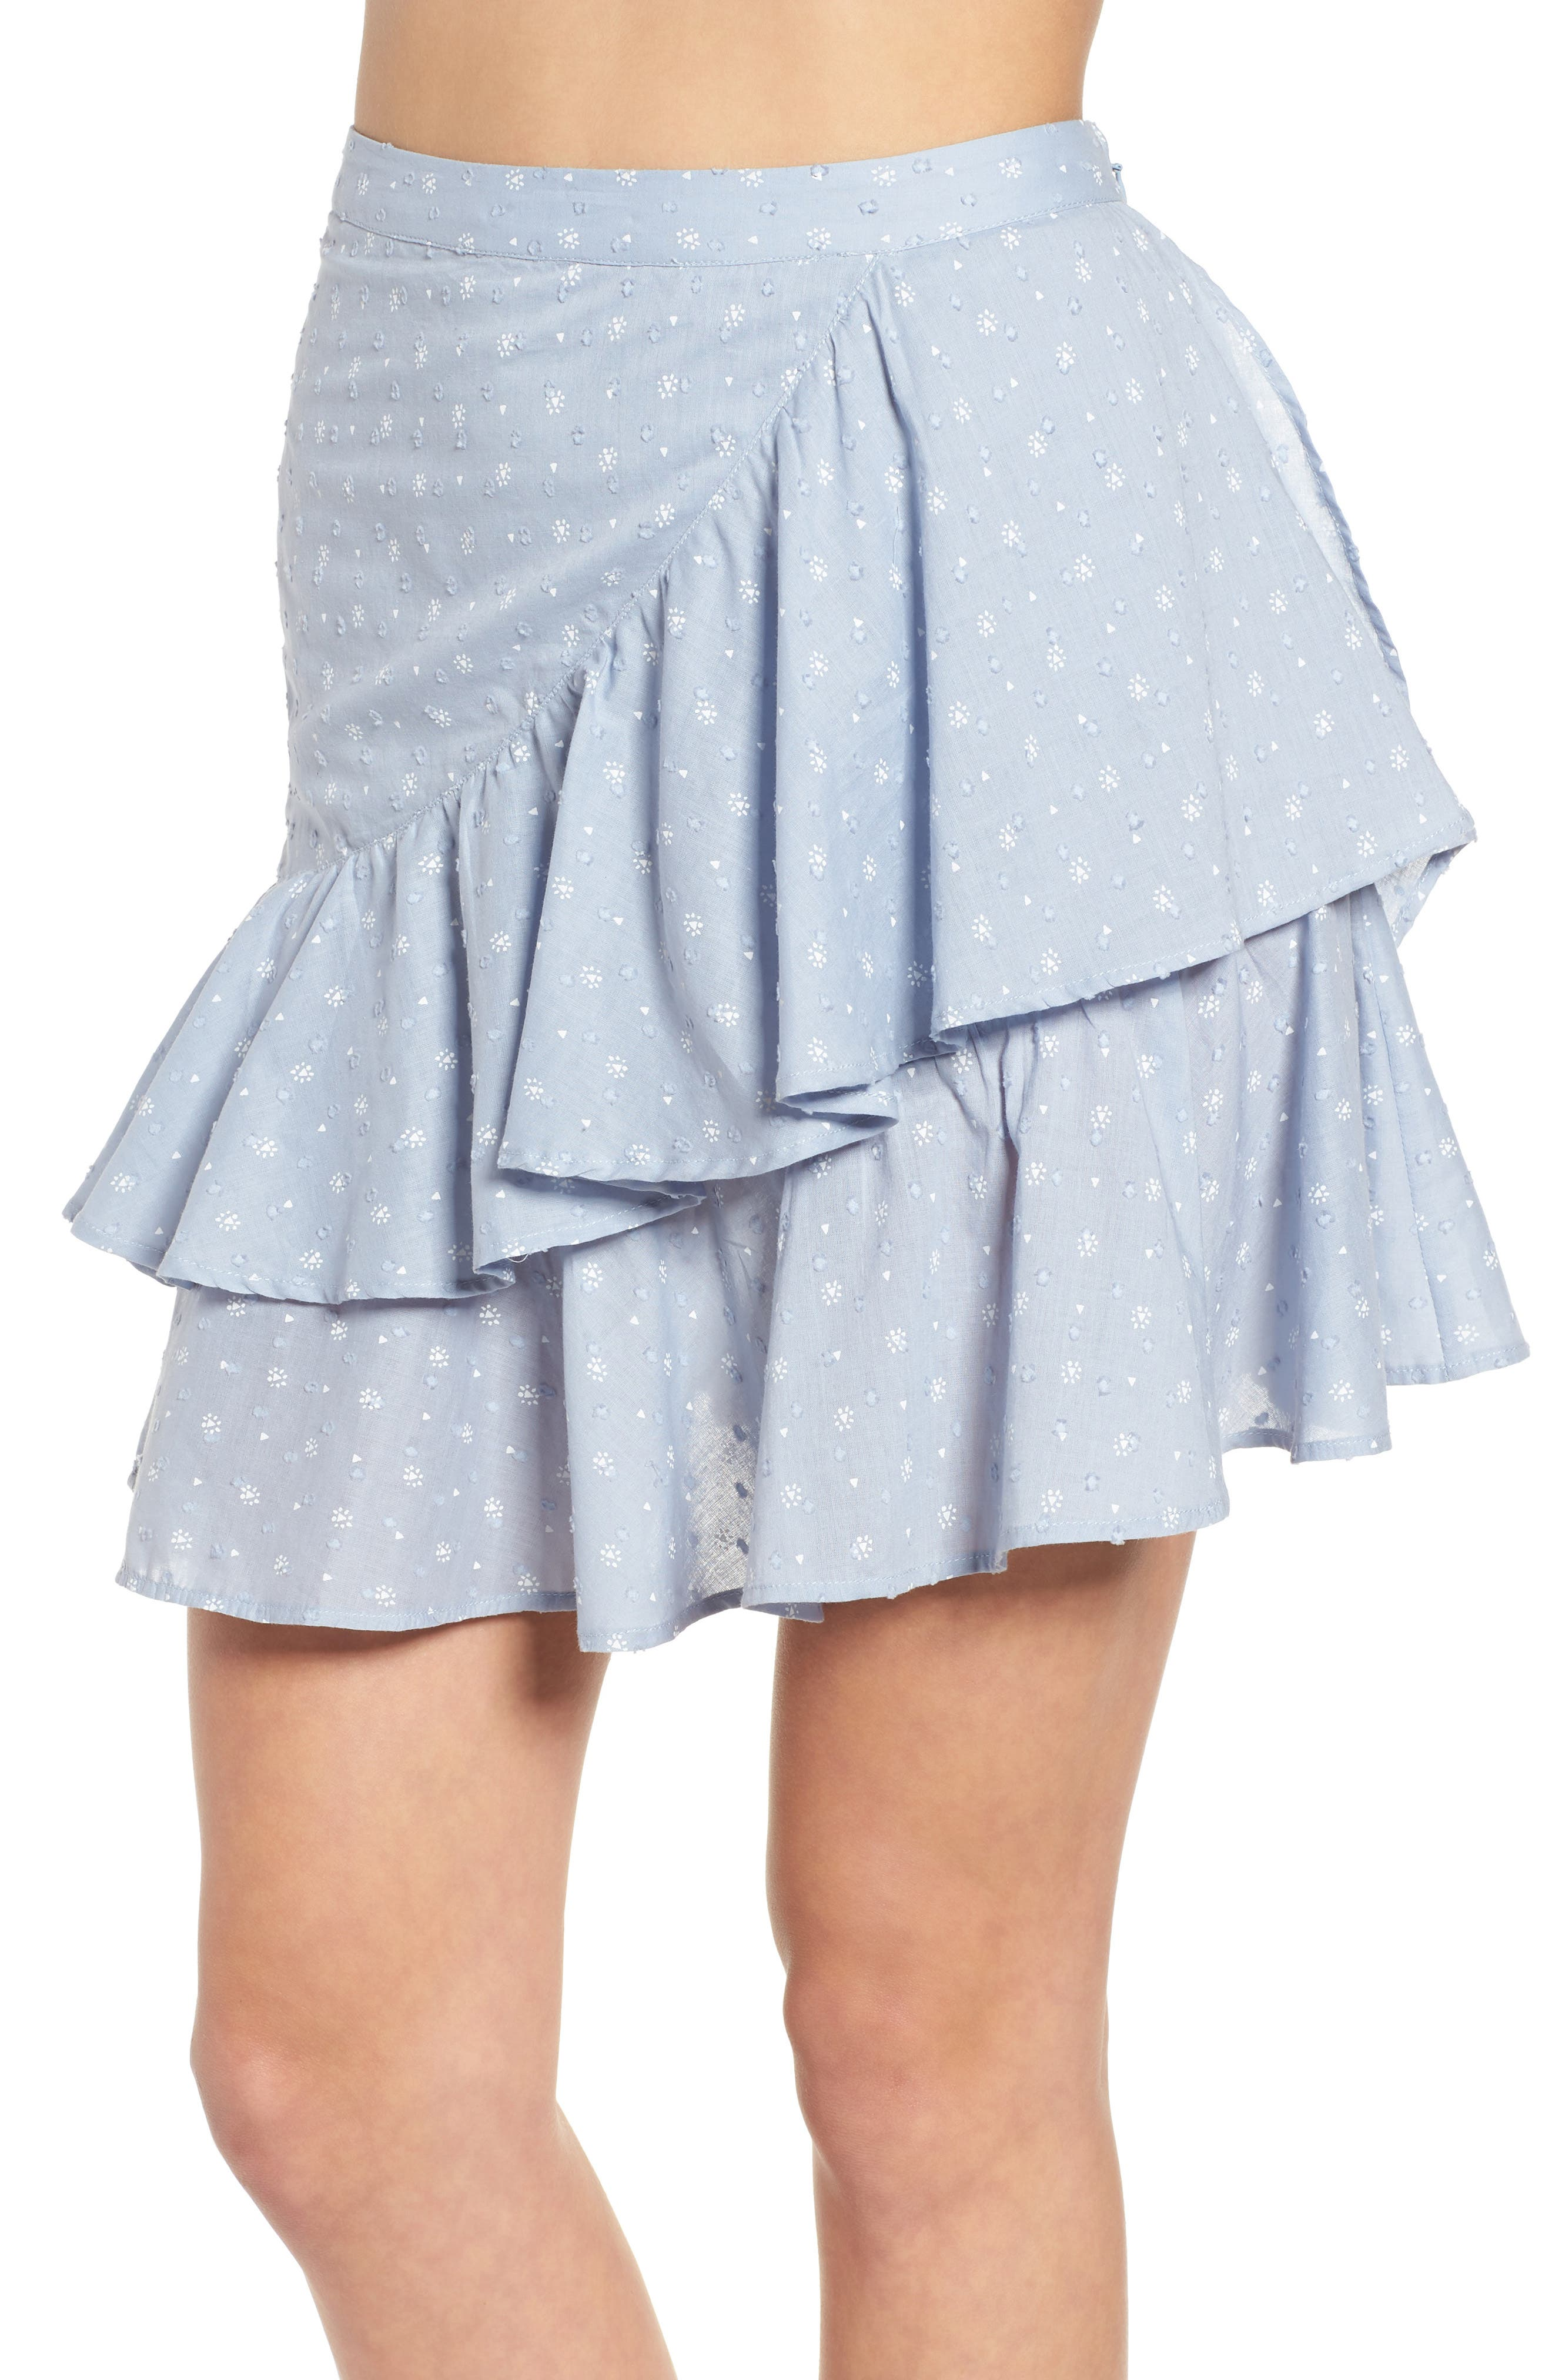 Mara Ruffled Miniskirt,                             Alternate thumbnail 5, color,                             Sail Blue